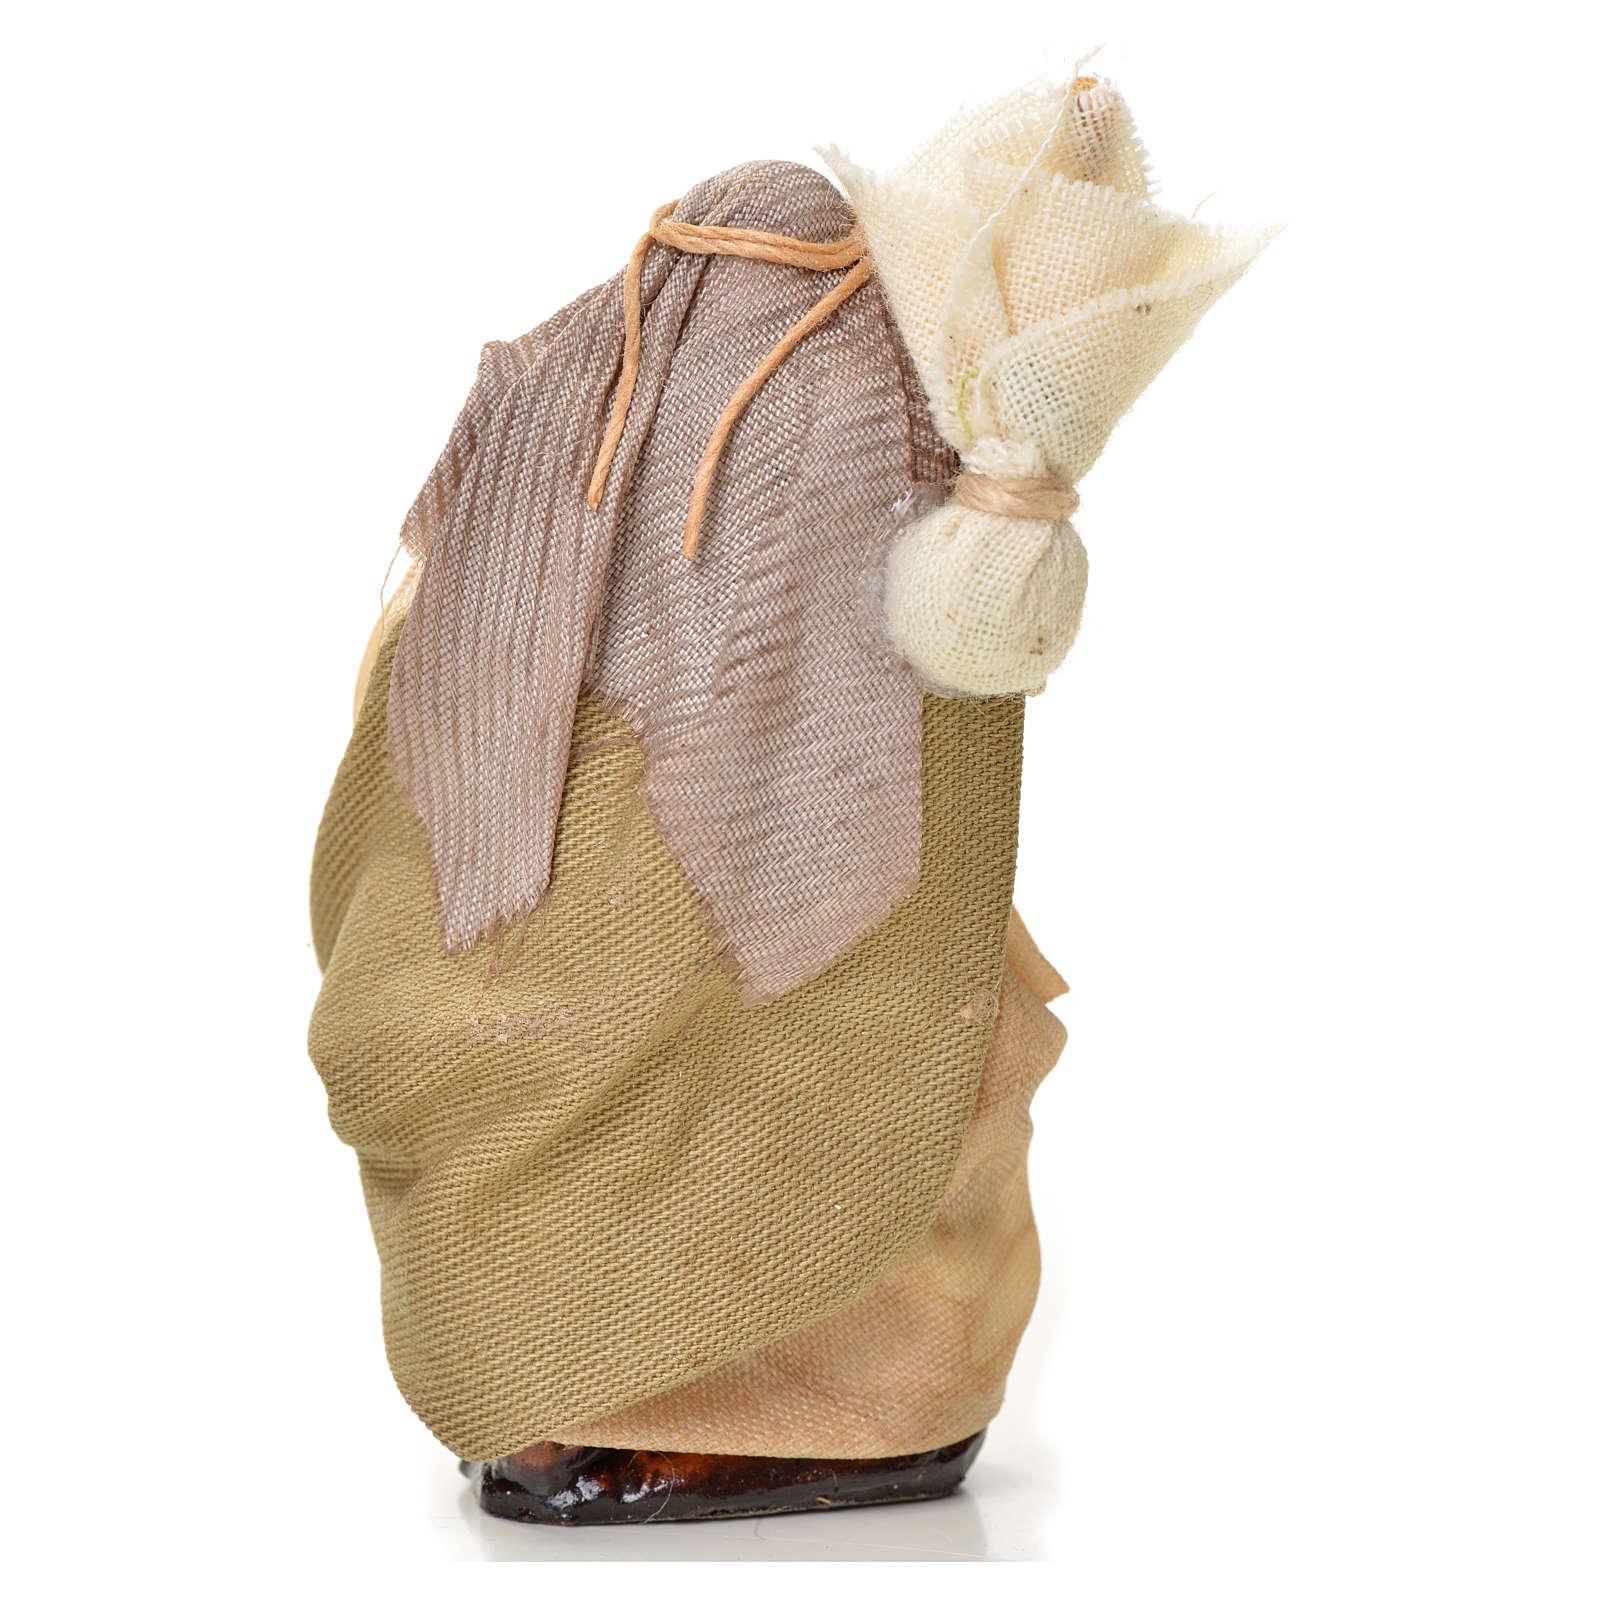 Neapolitan Nativity figurine, man with sack, 6 cm 4